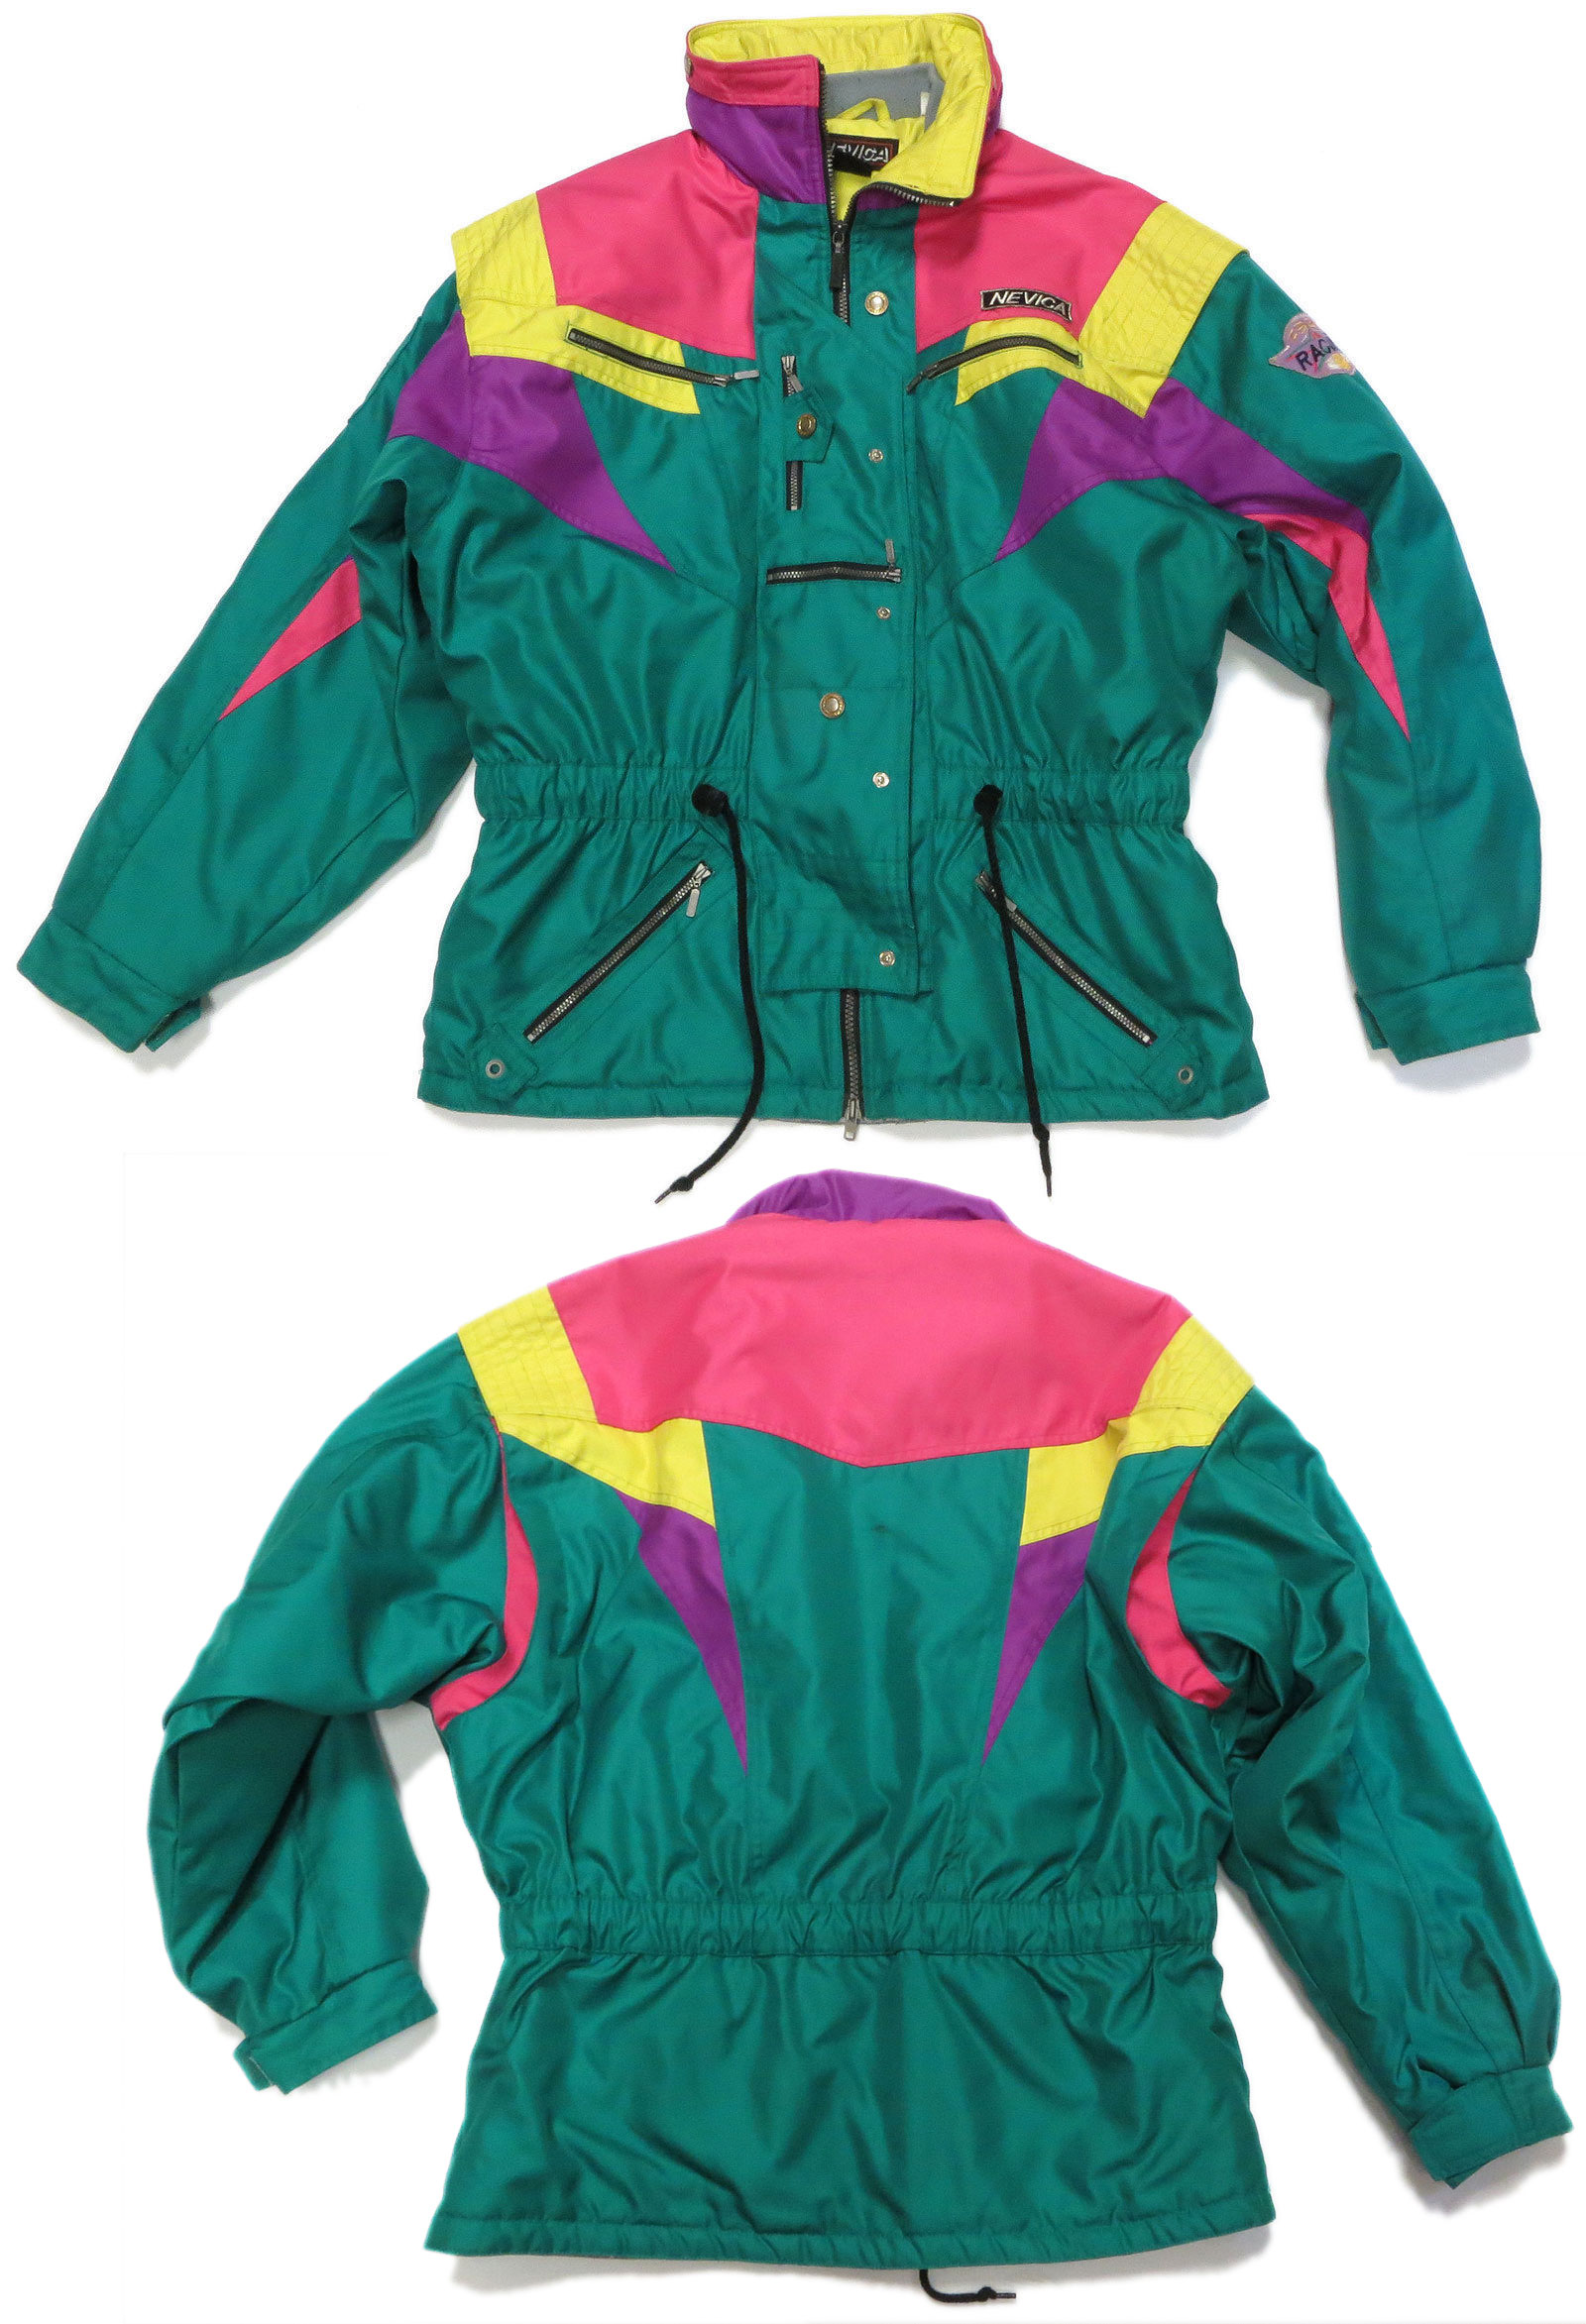 Vintage 80s Skit Suit